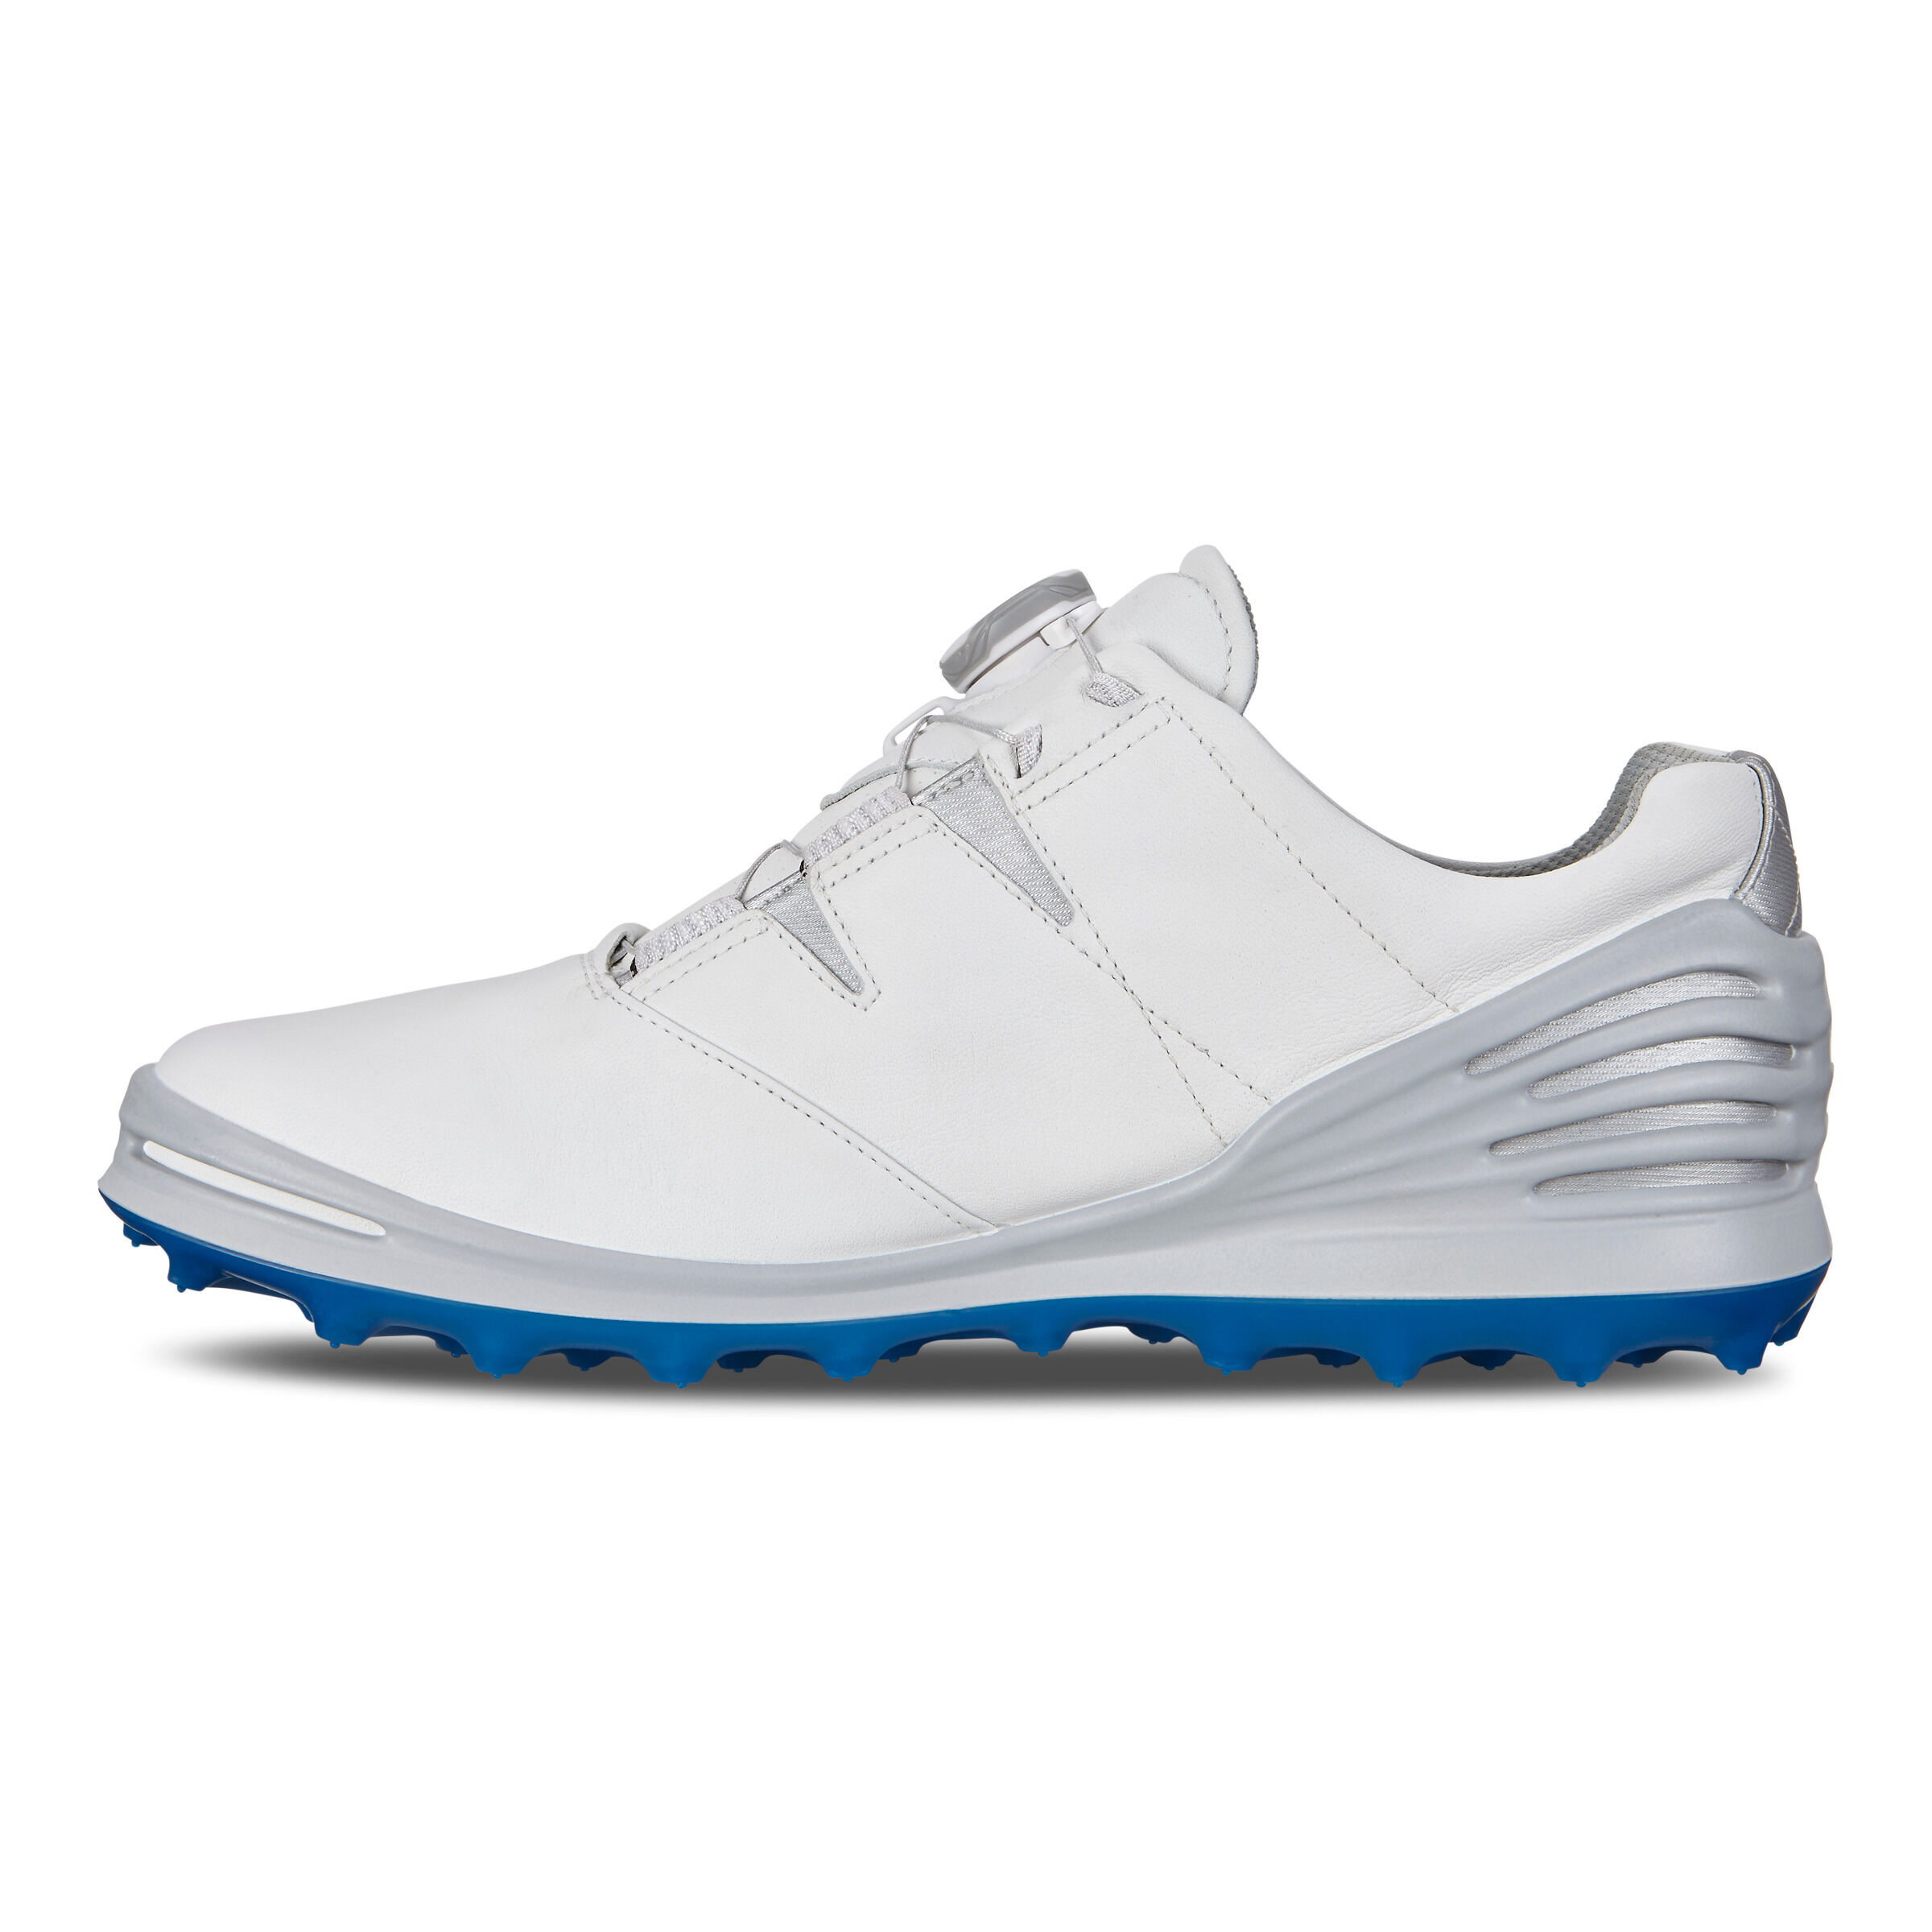 Ecco Mens Cage Pro Boa 2 Golf Shoes 63 Off Tajpalace Net